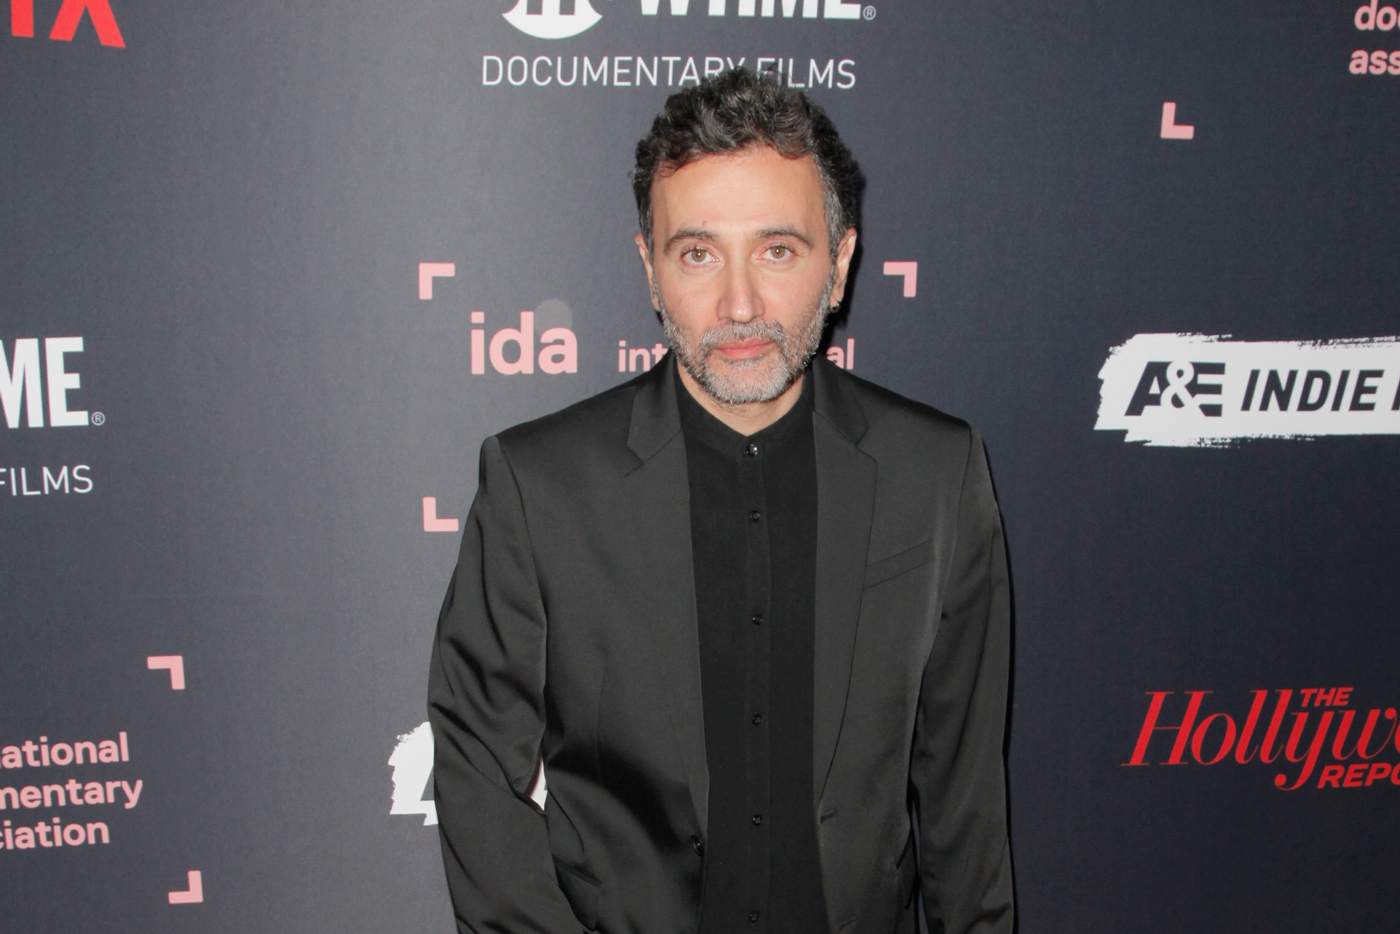 Filmmaker Talal Derki at the 2018 IDA Documentary Awards. Photo by Tibrina Hobson.